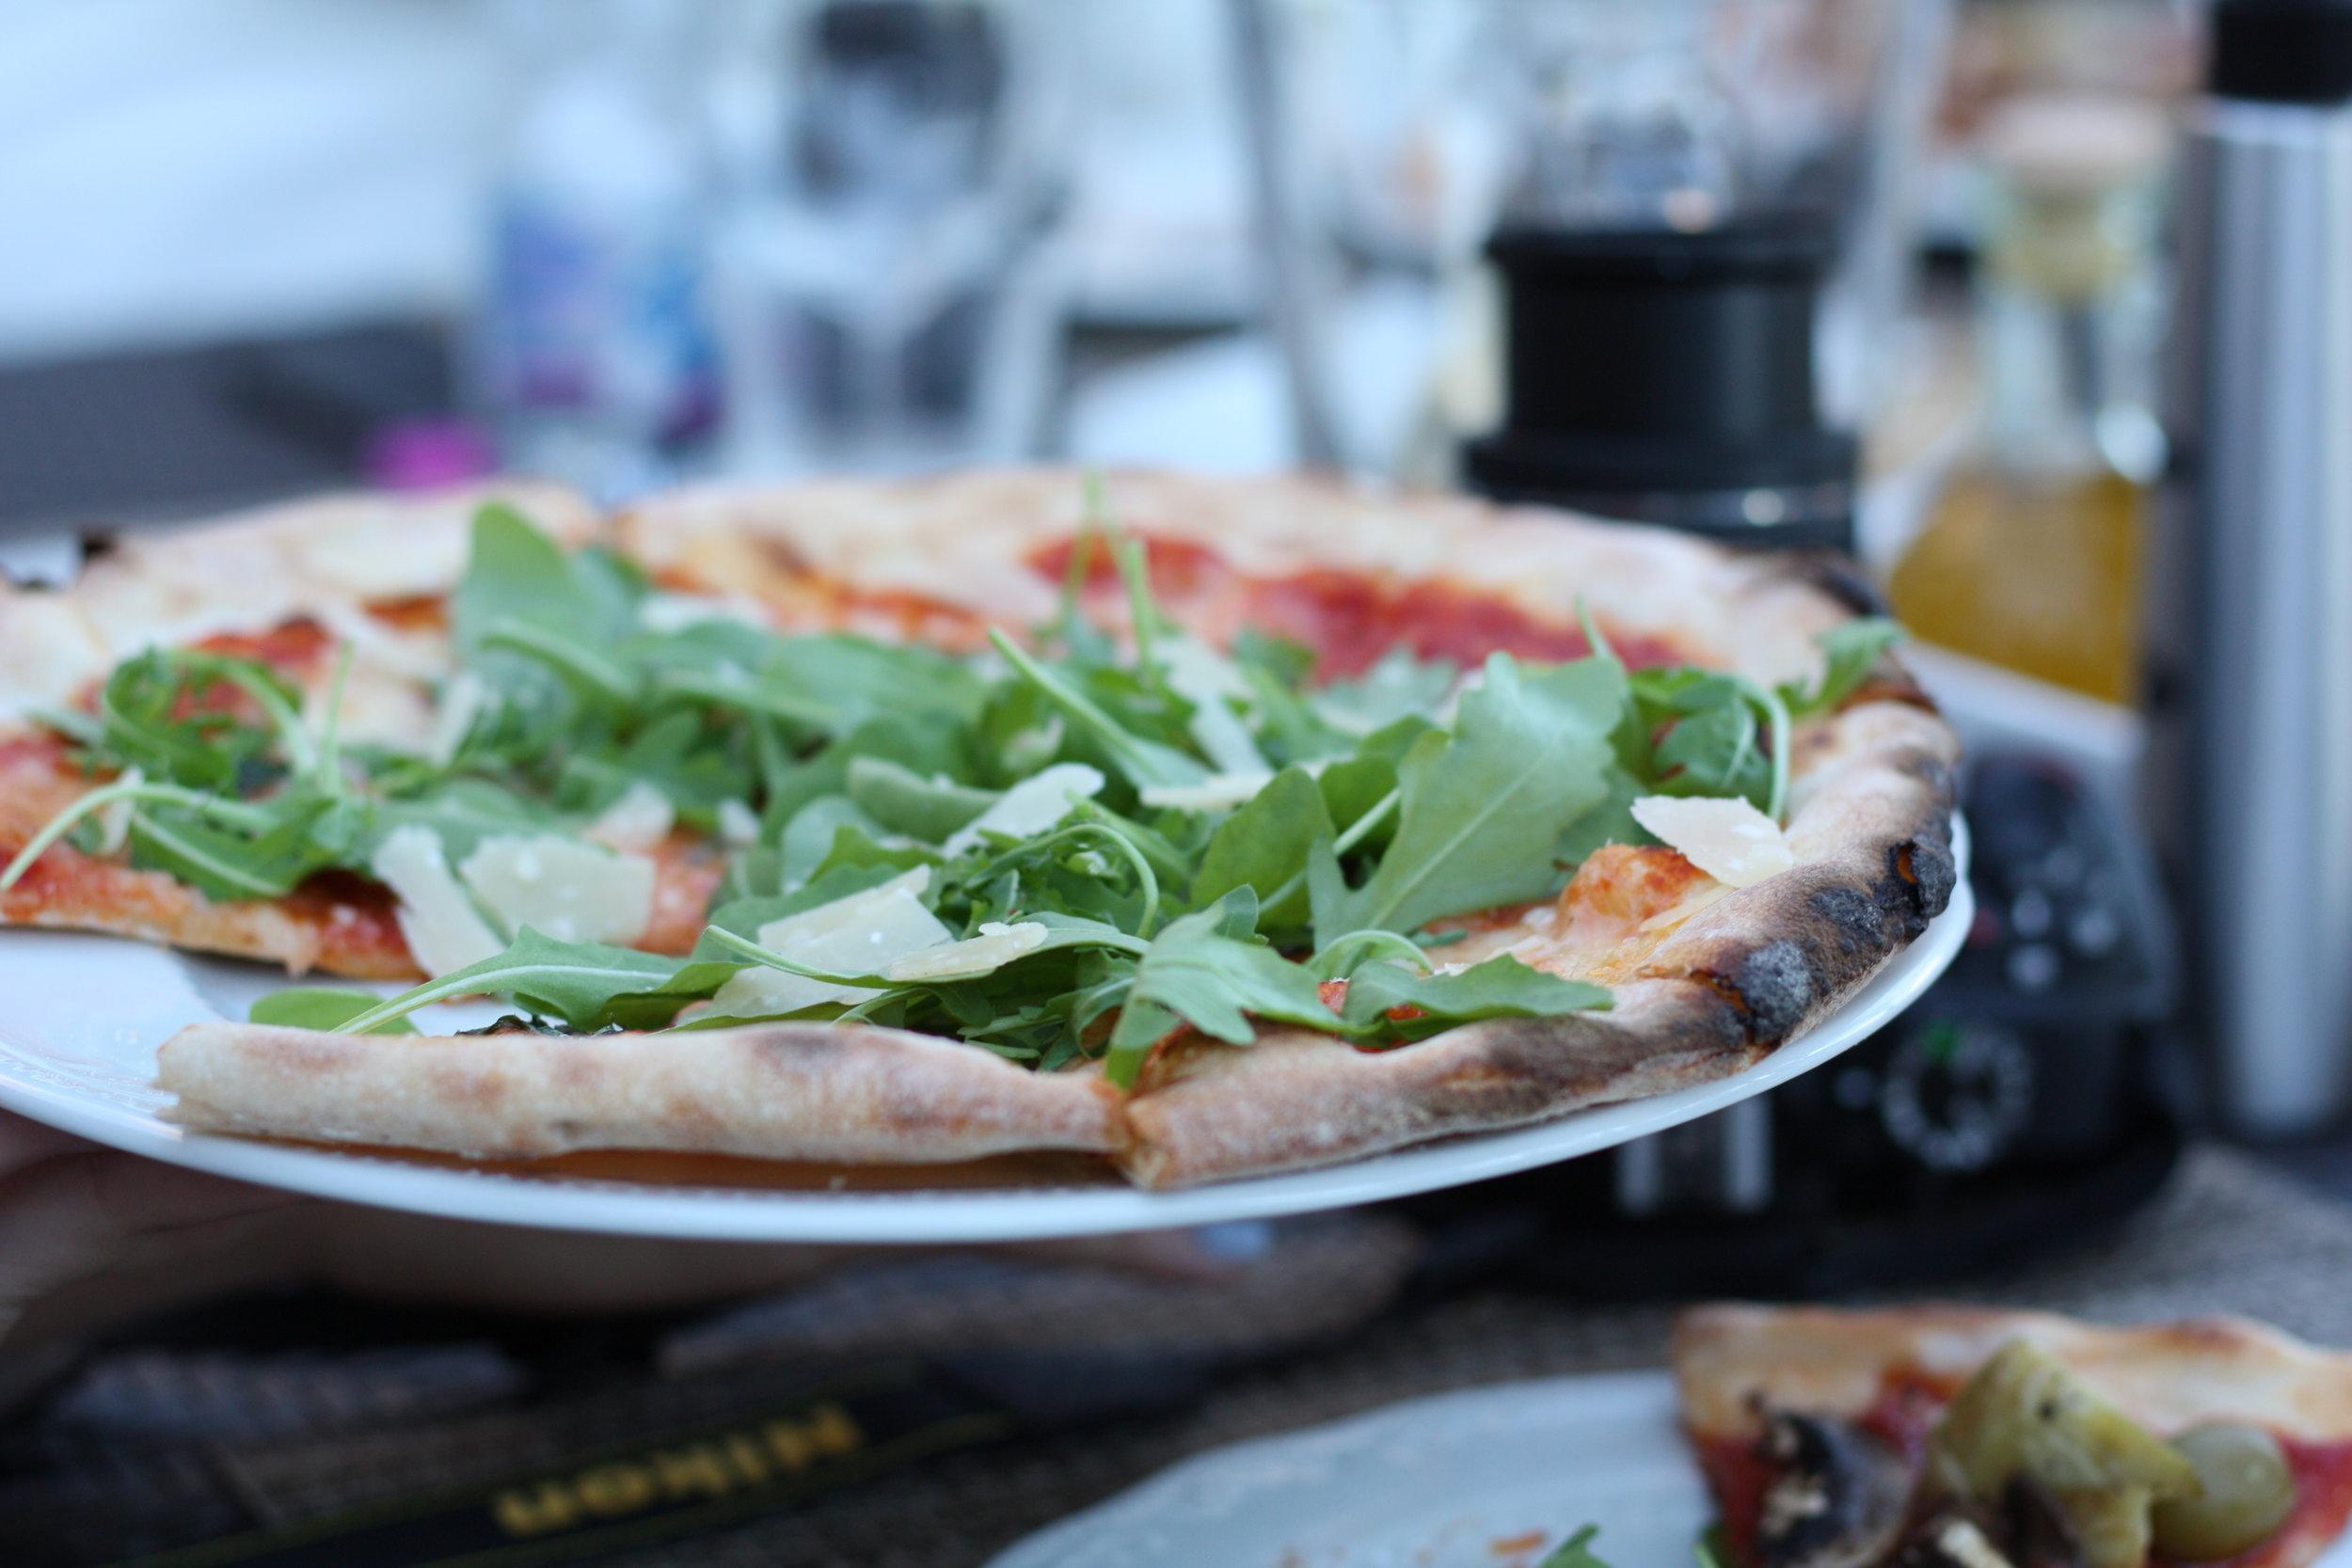 Pizza in Tuscany, Italy: June 2017